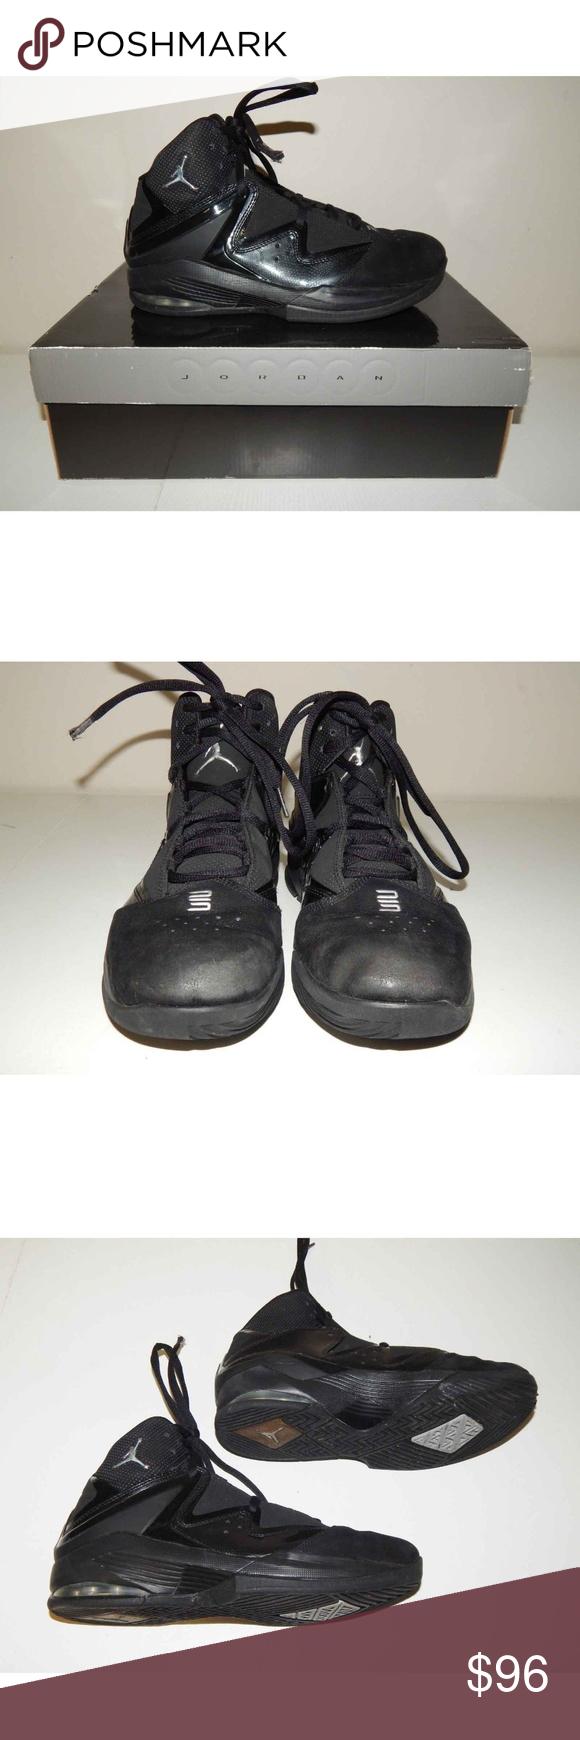 c770dea735c Jordan Pure J Mens Size 8 Black Sneakers Nike Air Jordan (Nike Air) Pure